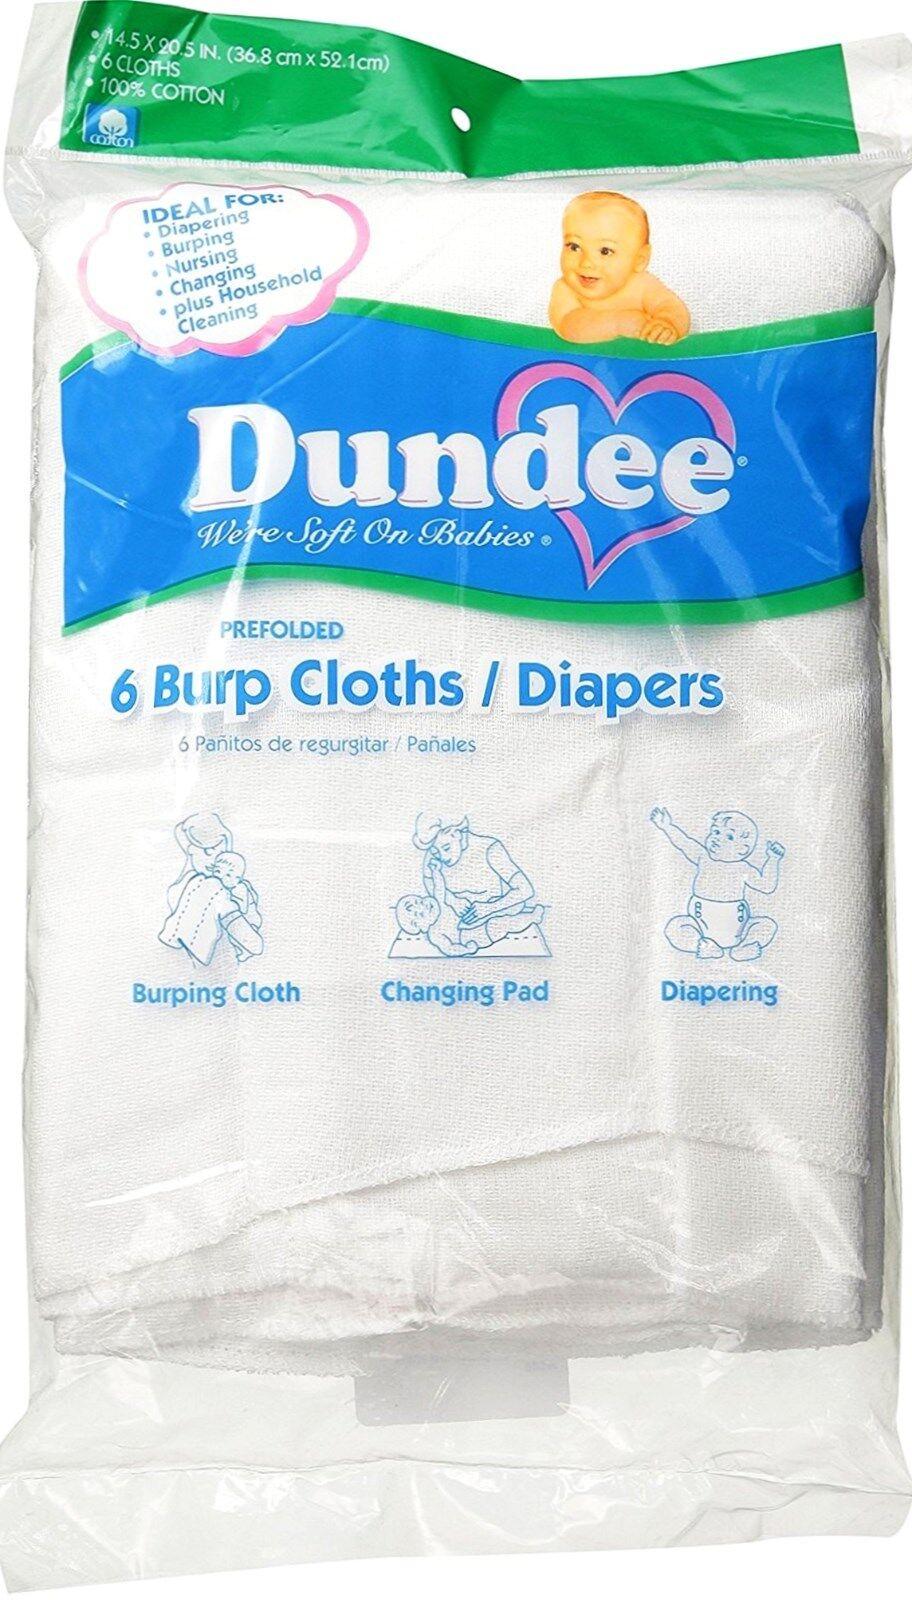 6 burp cloths diapers White 100% COTTON prefolded birdseye w